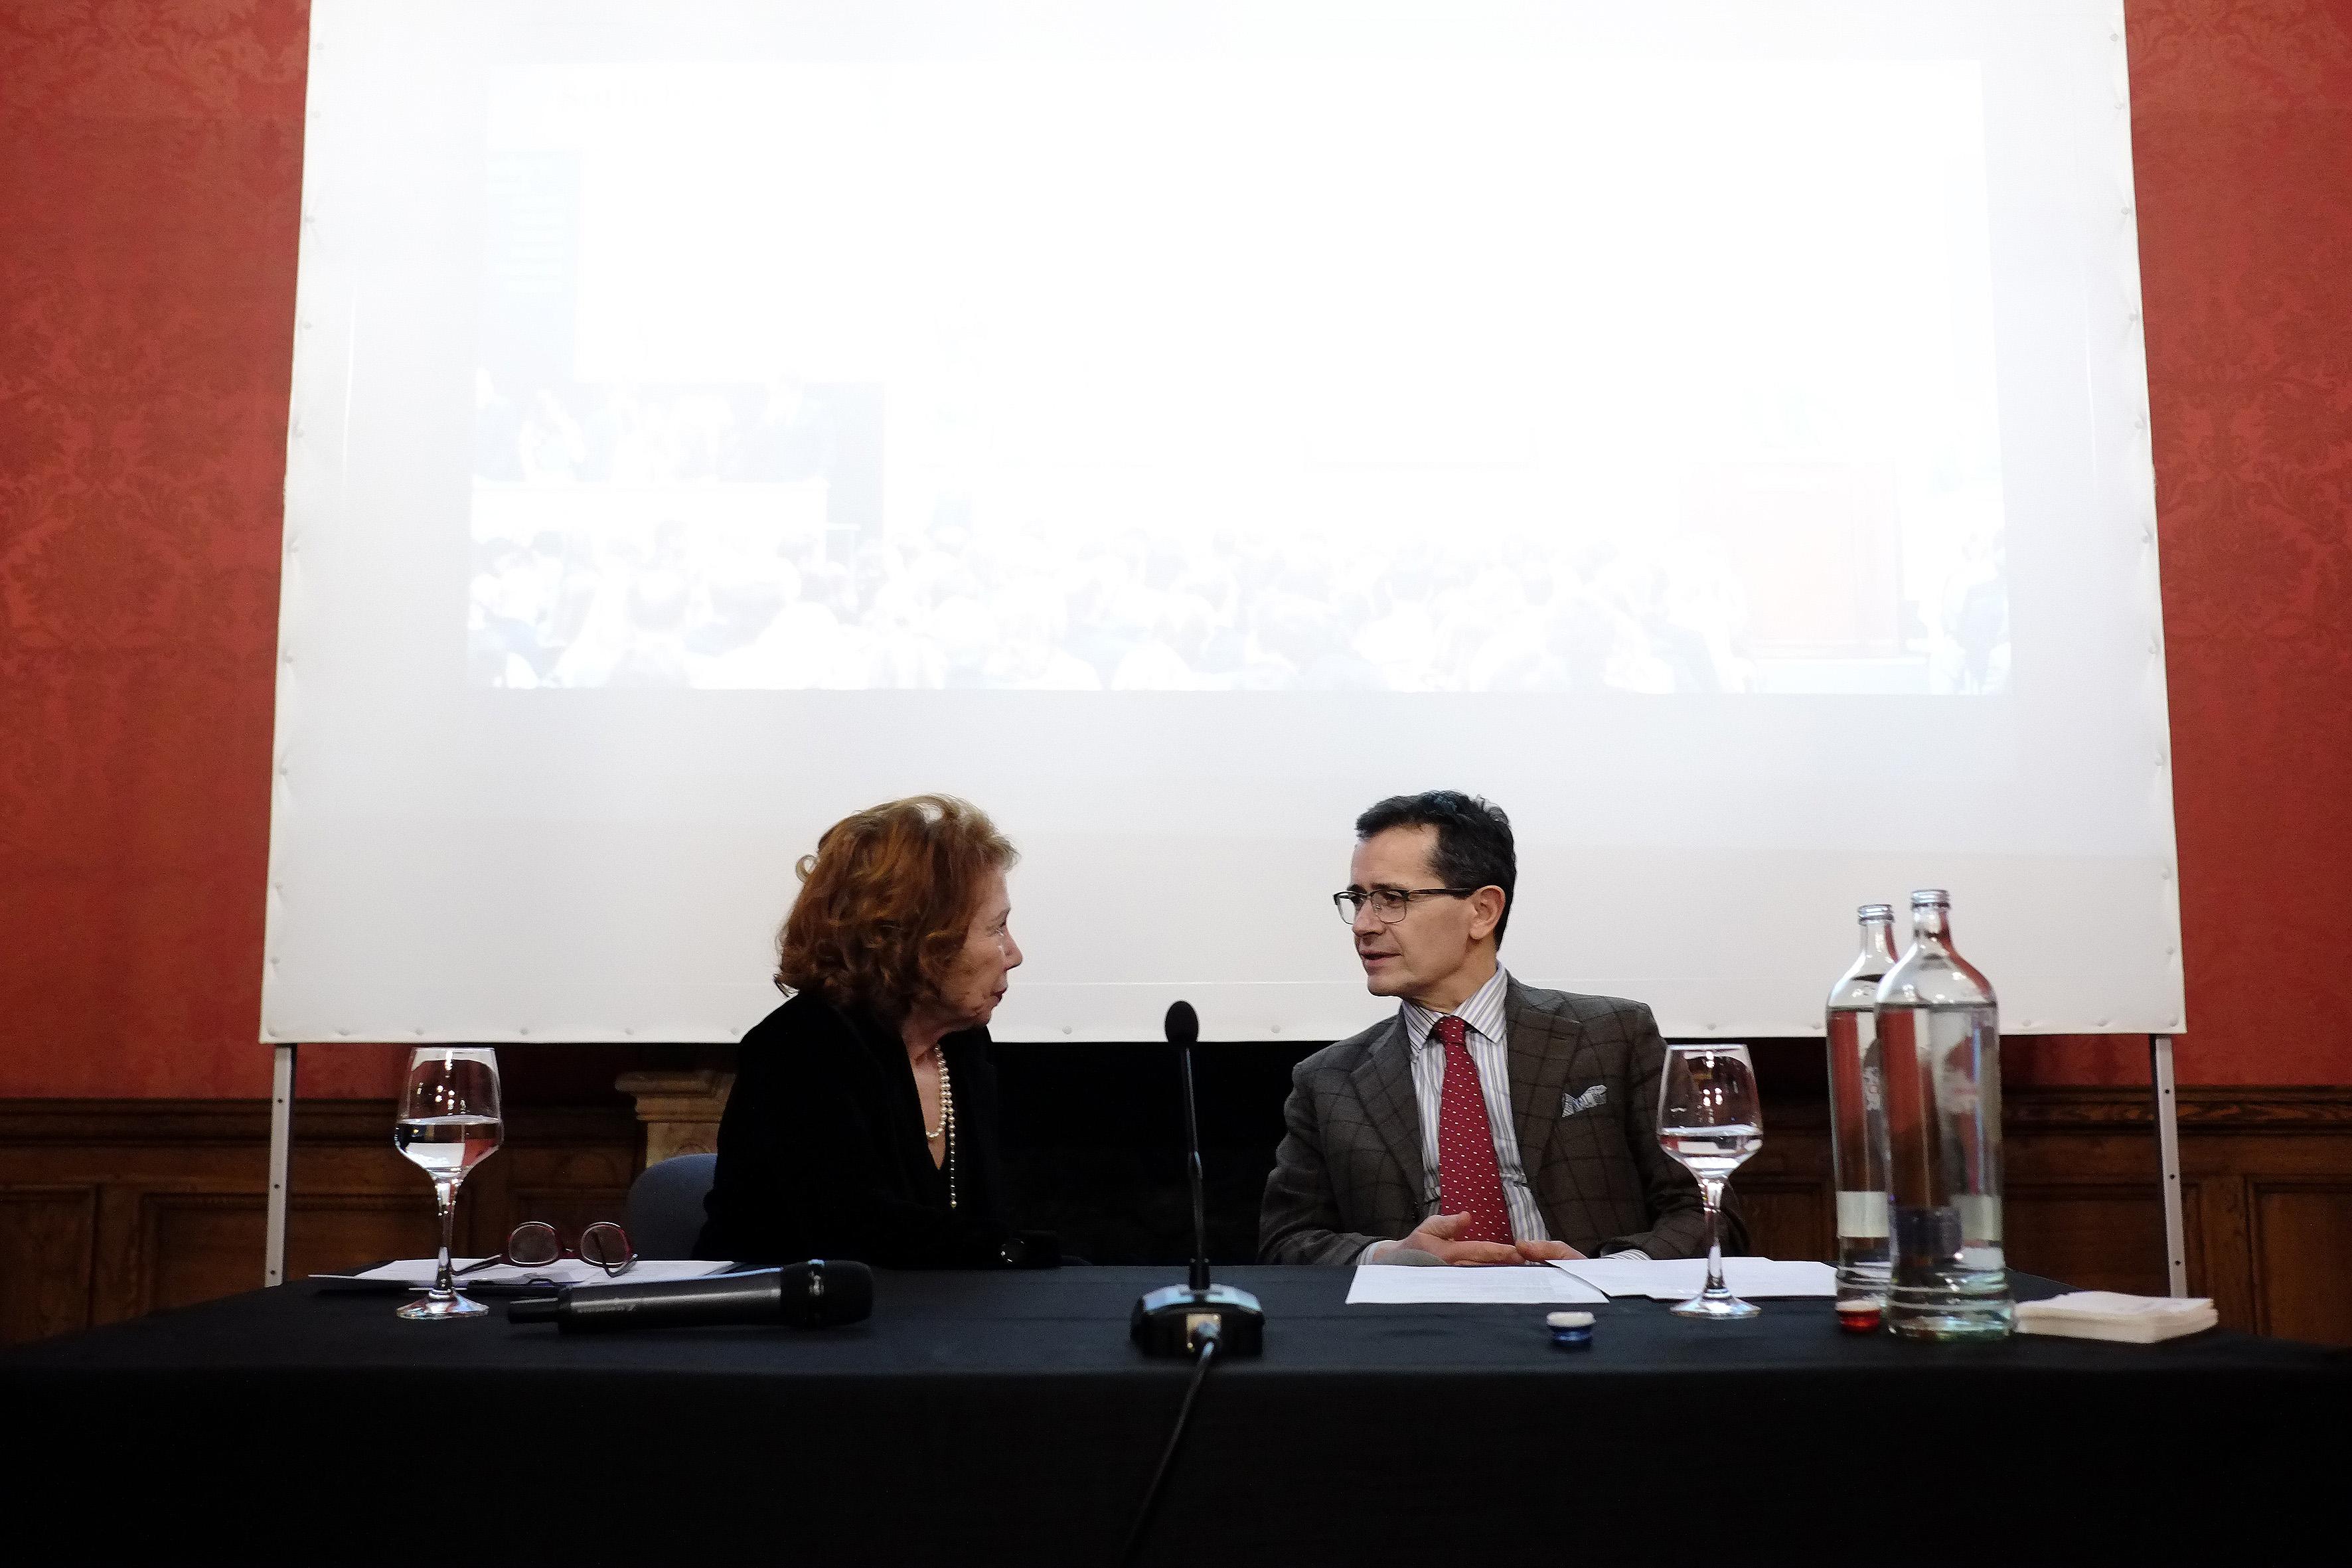 STEFANO MORENI, Senior Director and Head of Contemporary Art, Sotheby's